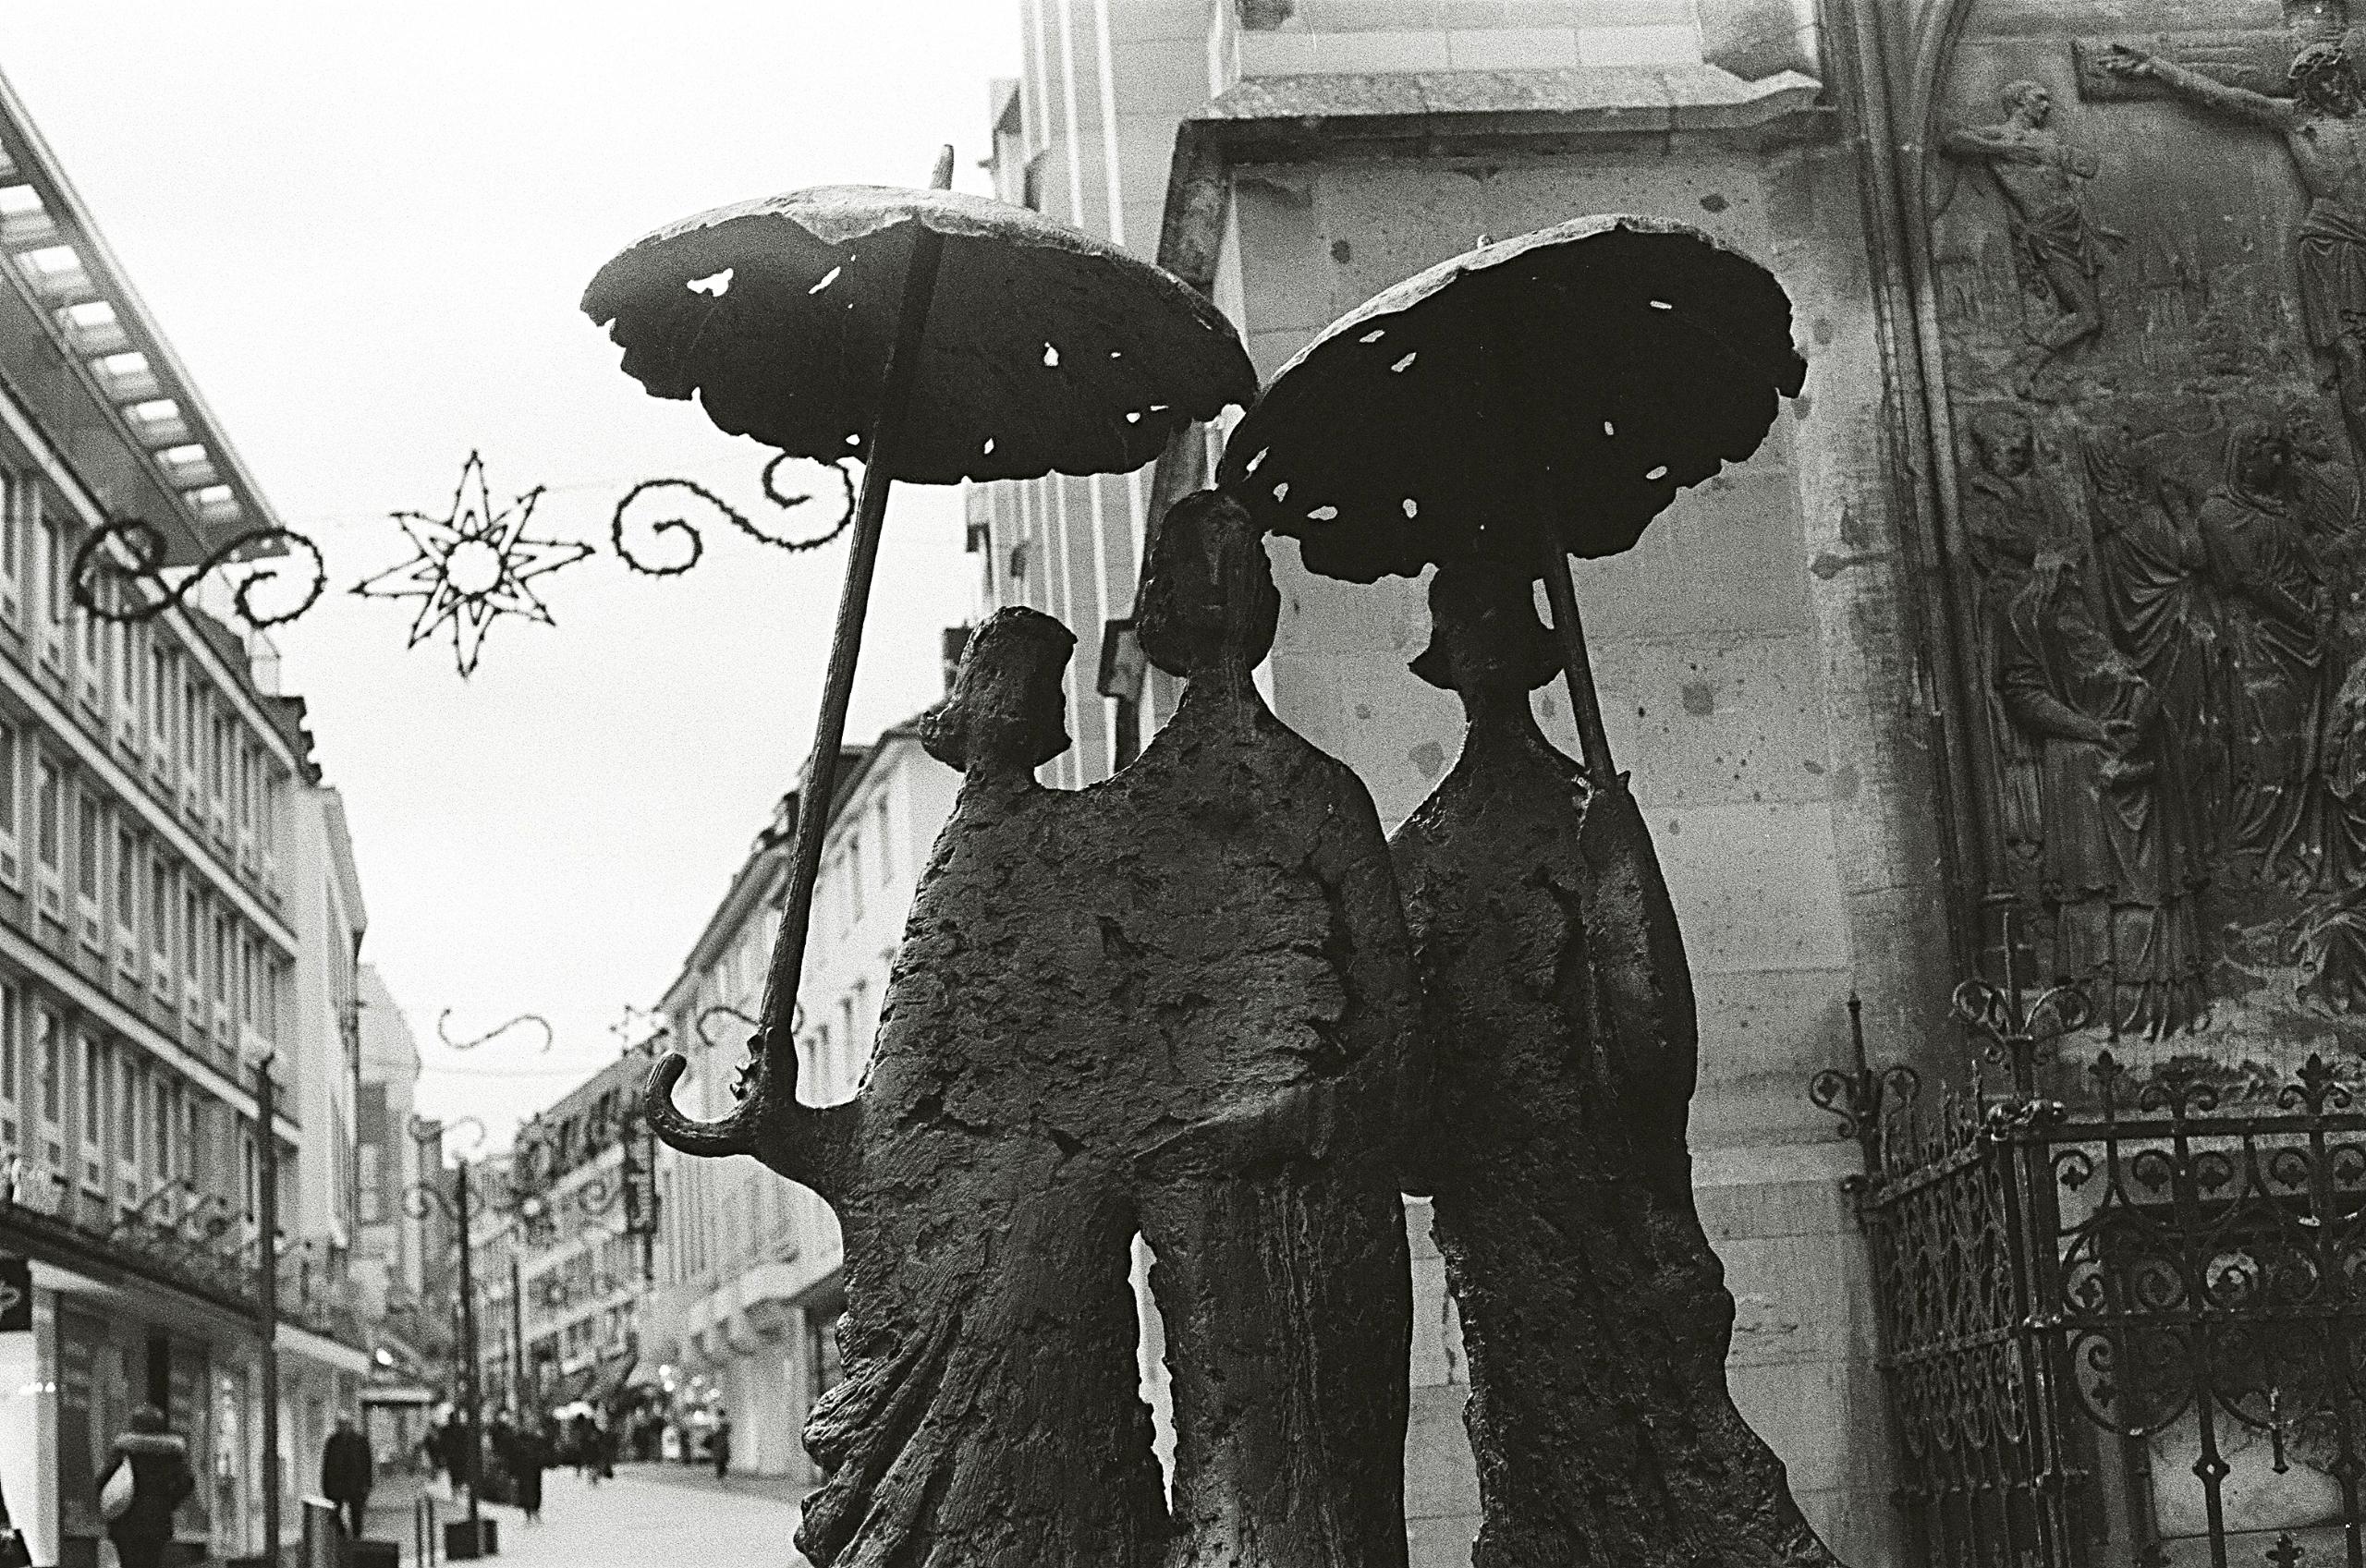 Damen mit Regenschirm Camera: P - walter_ac   ello